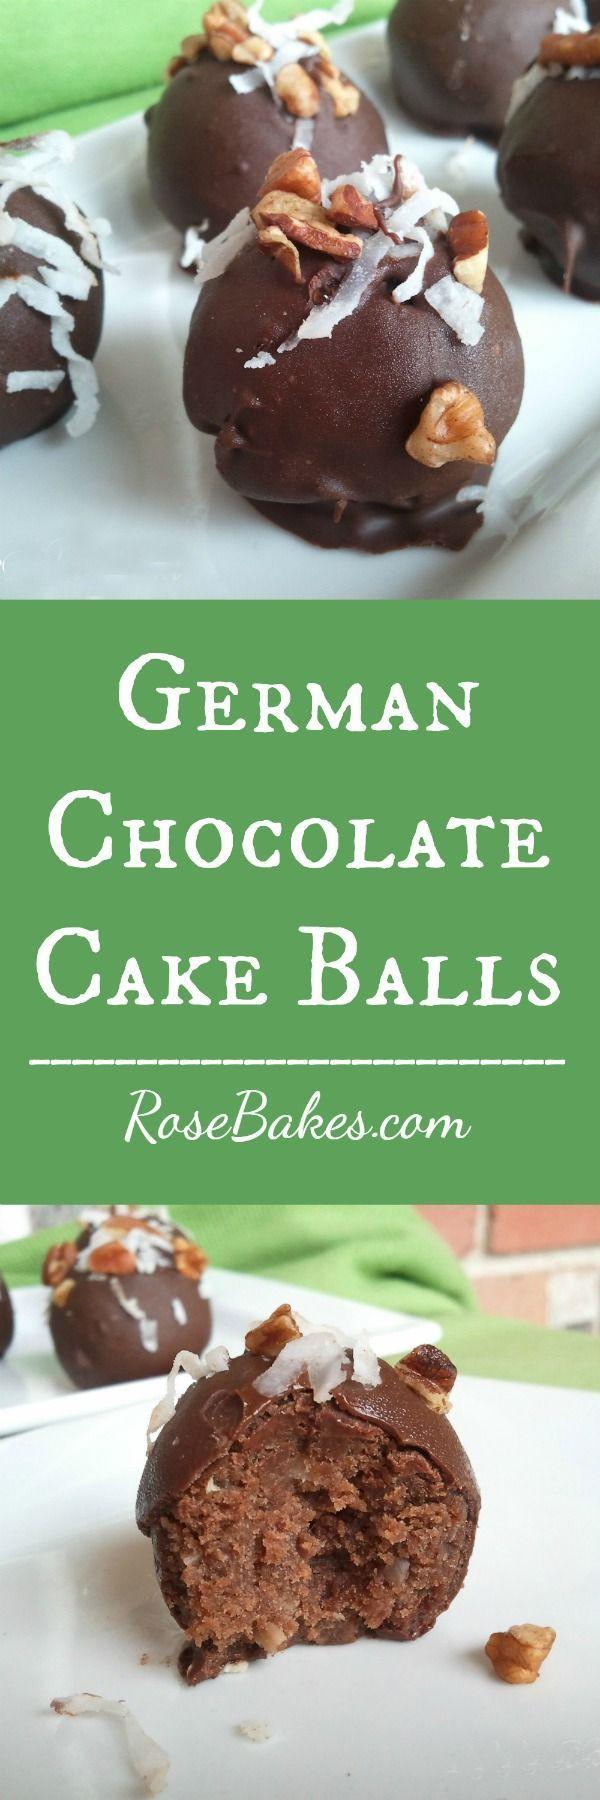 German Chocolate Cake Balls | RoseBakes.com